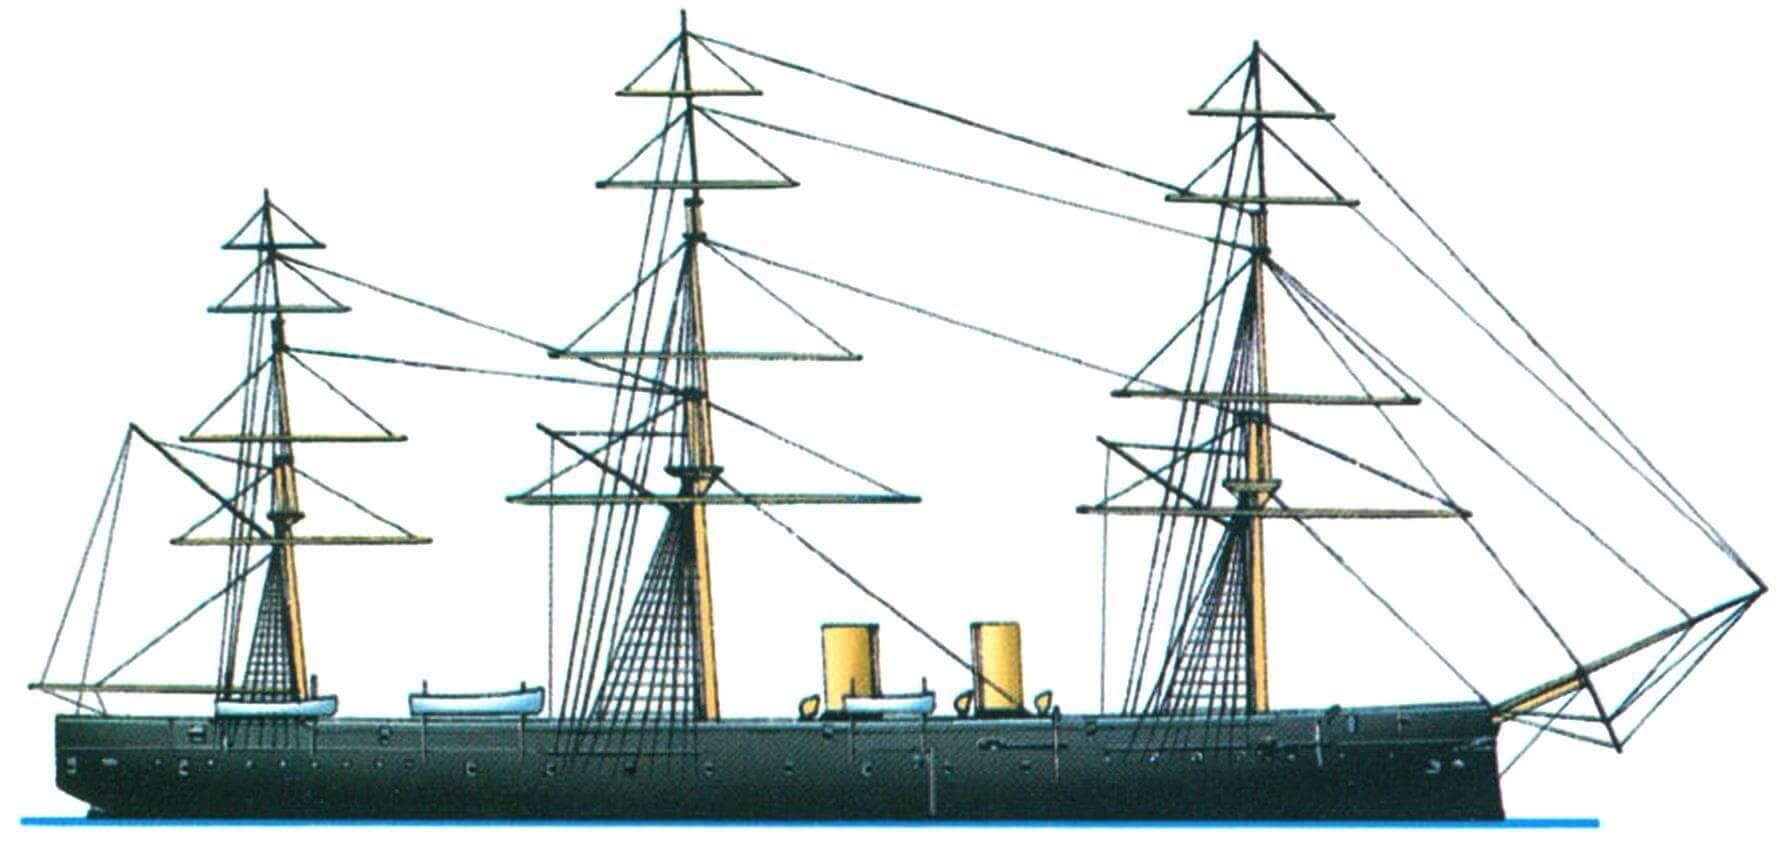 Винтовой фрегат «Шах», Англия, 1876 г.